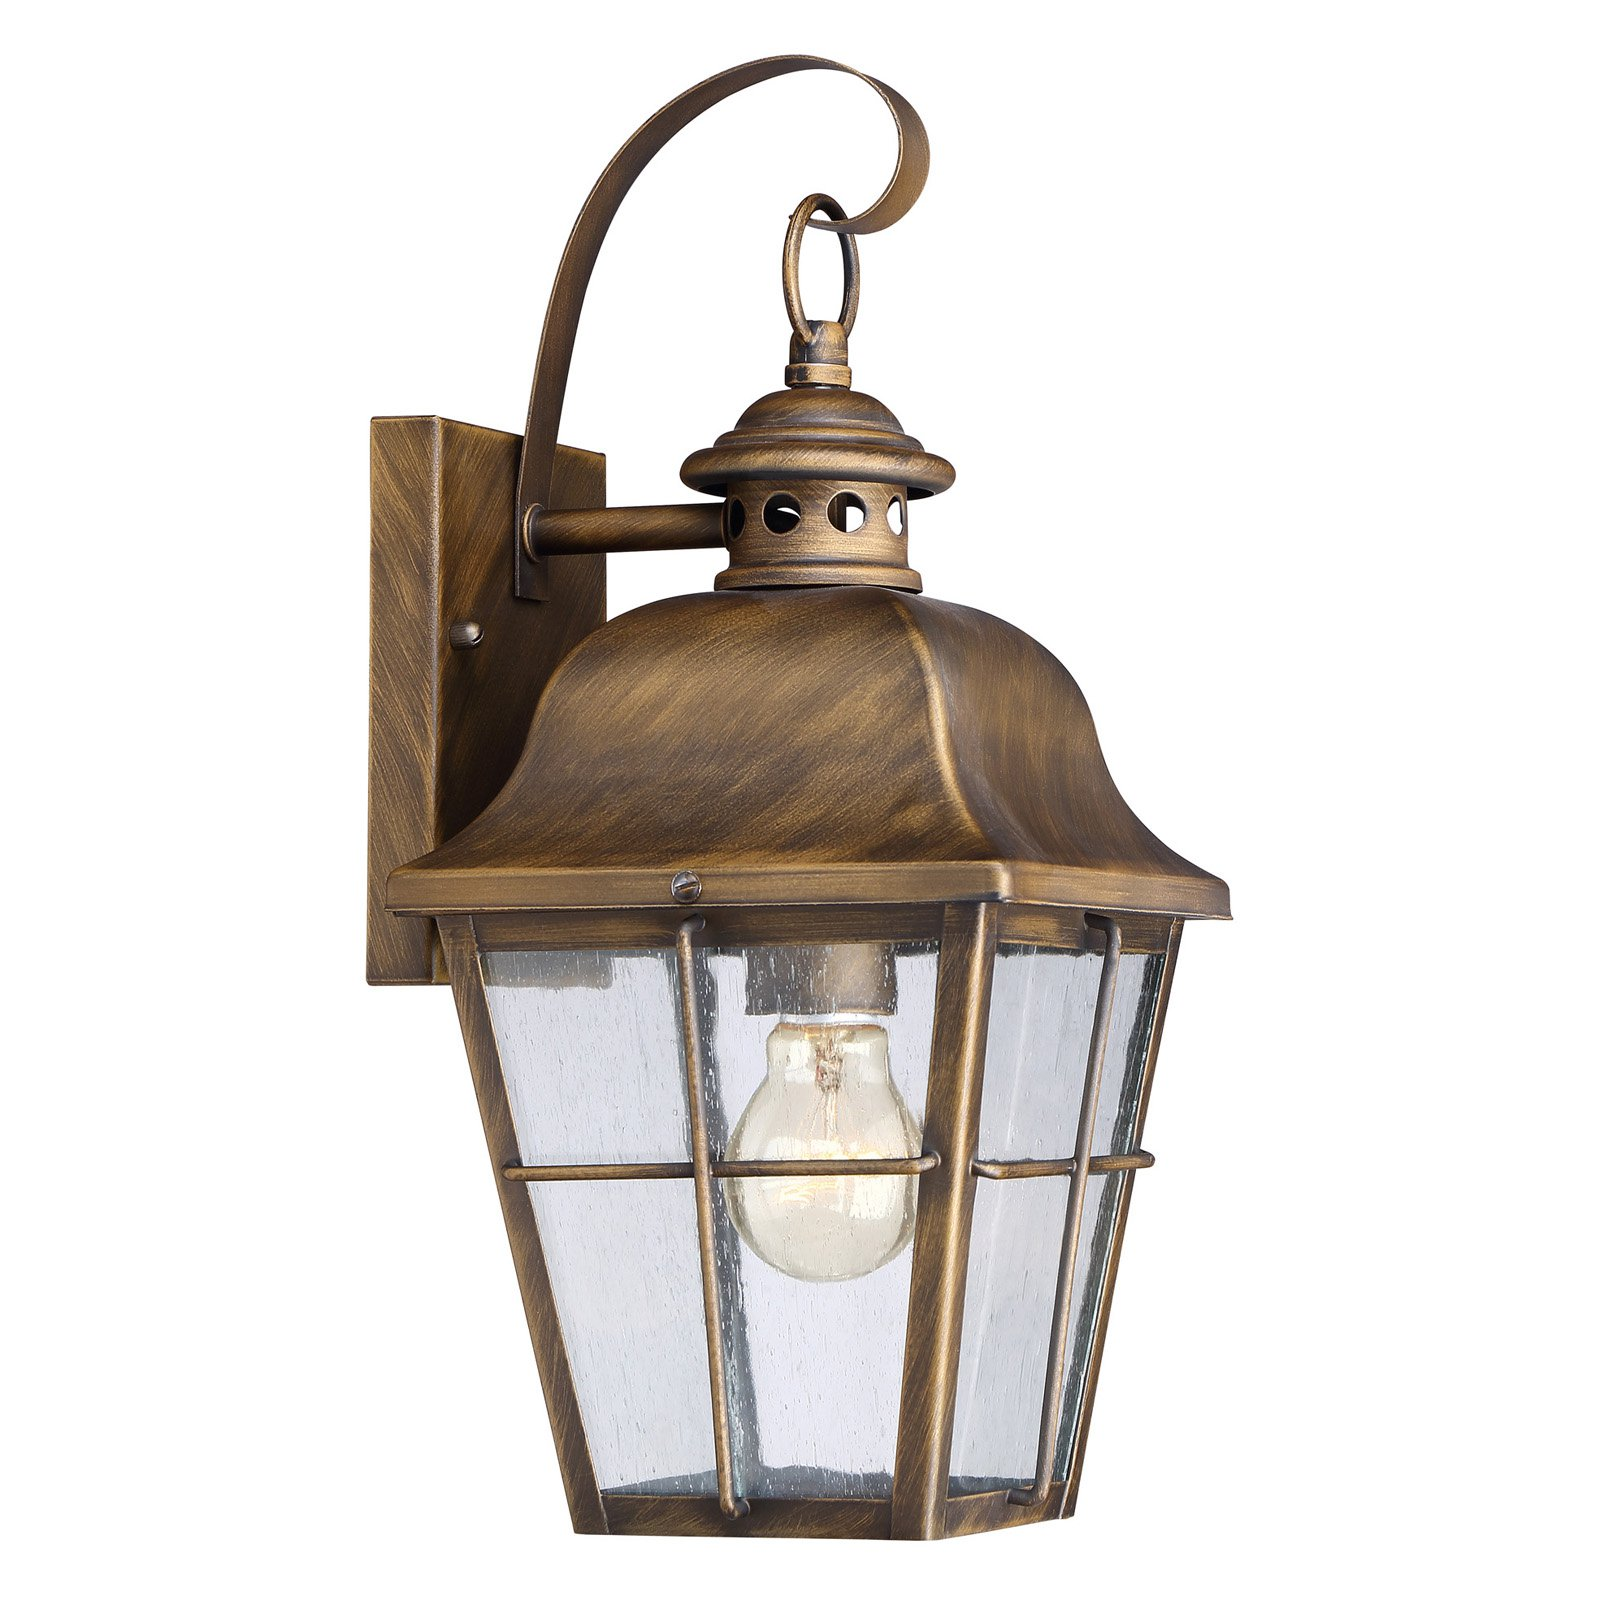 Quoizel Millhouse MHE8406K Outdoor Wall Lantern